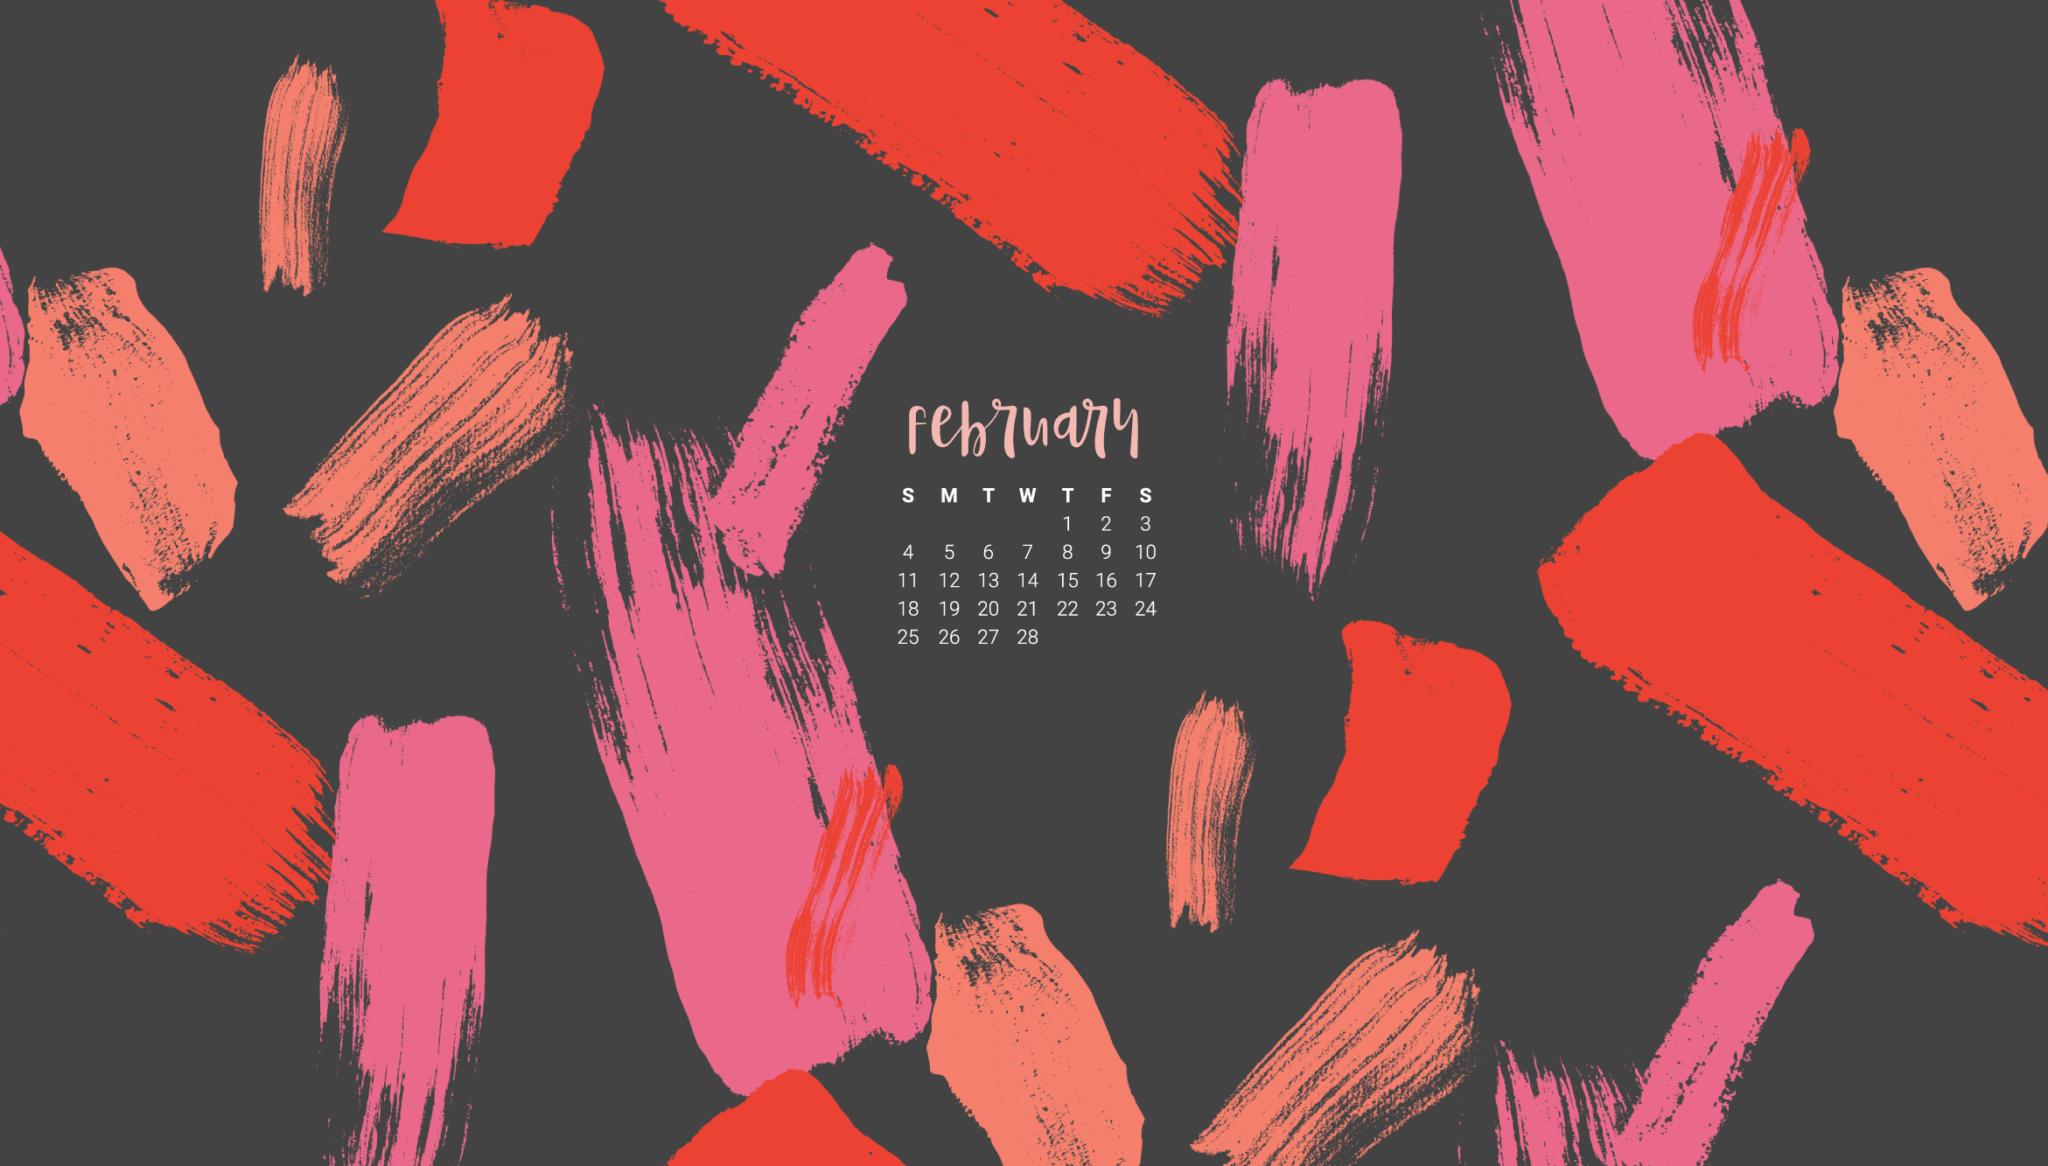 Free February desktop wallpaper calendars